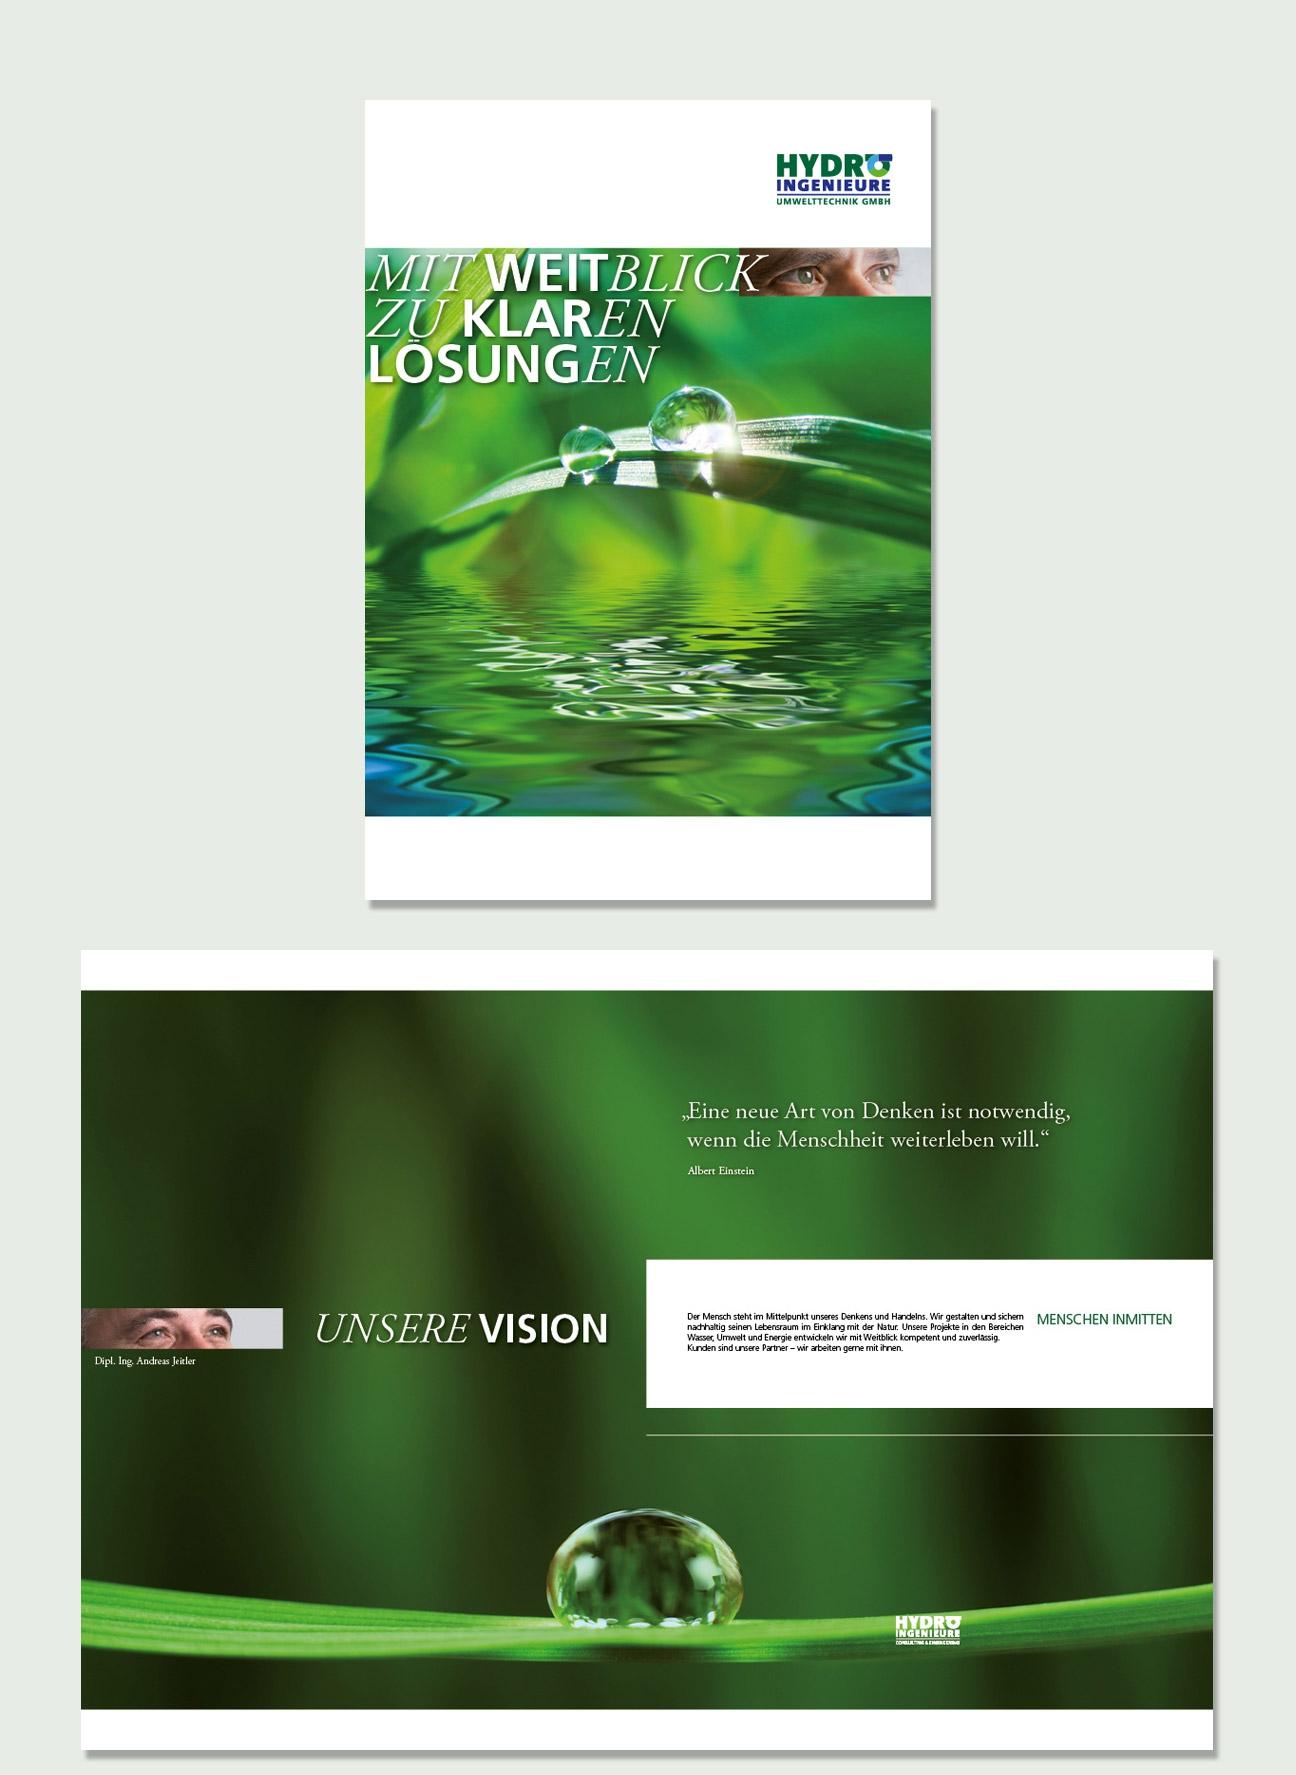 Hydro Ingenieure Corporate Identity Imagebroschüre Titel